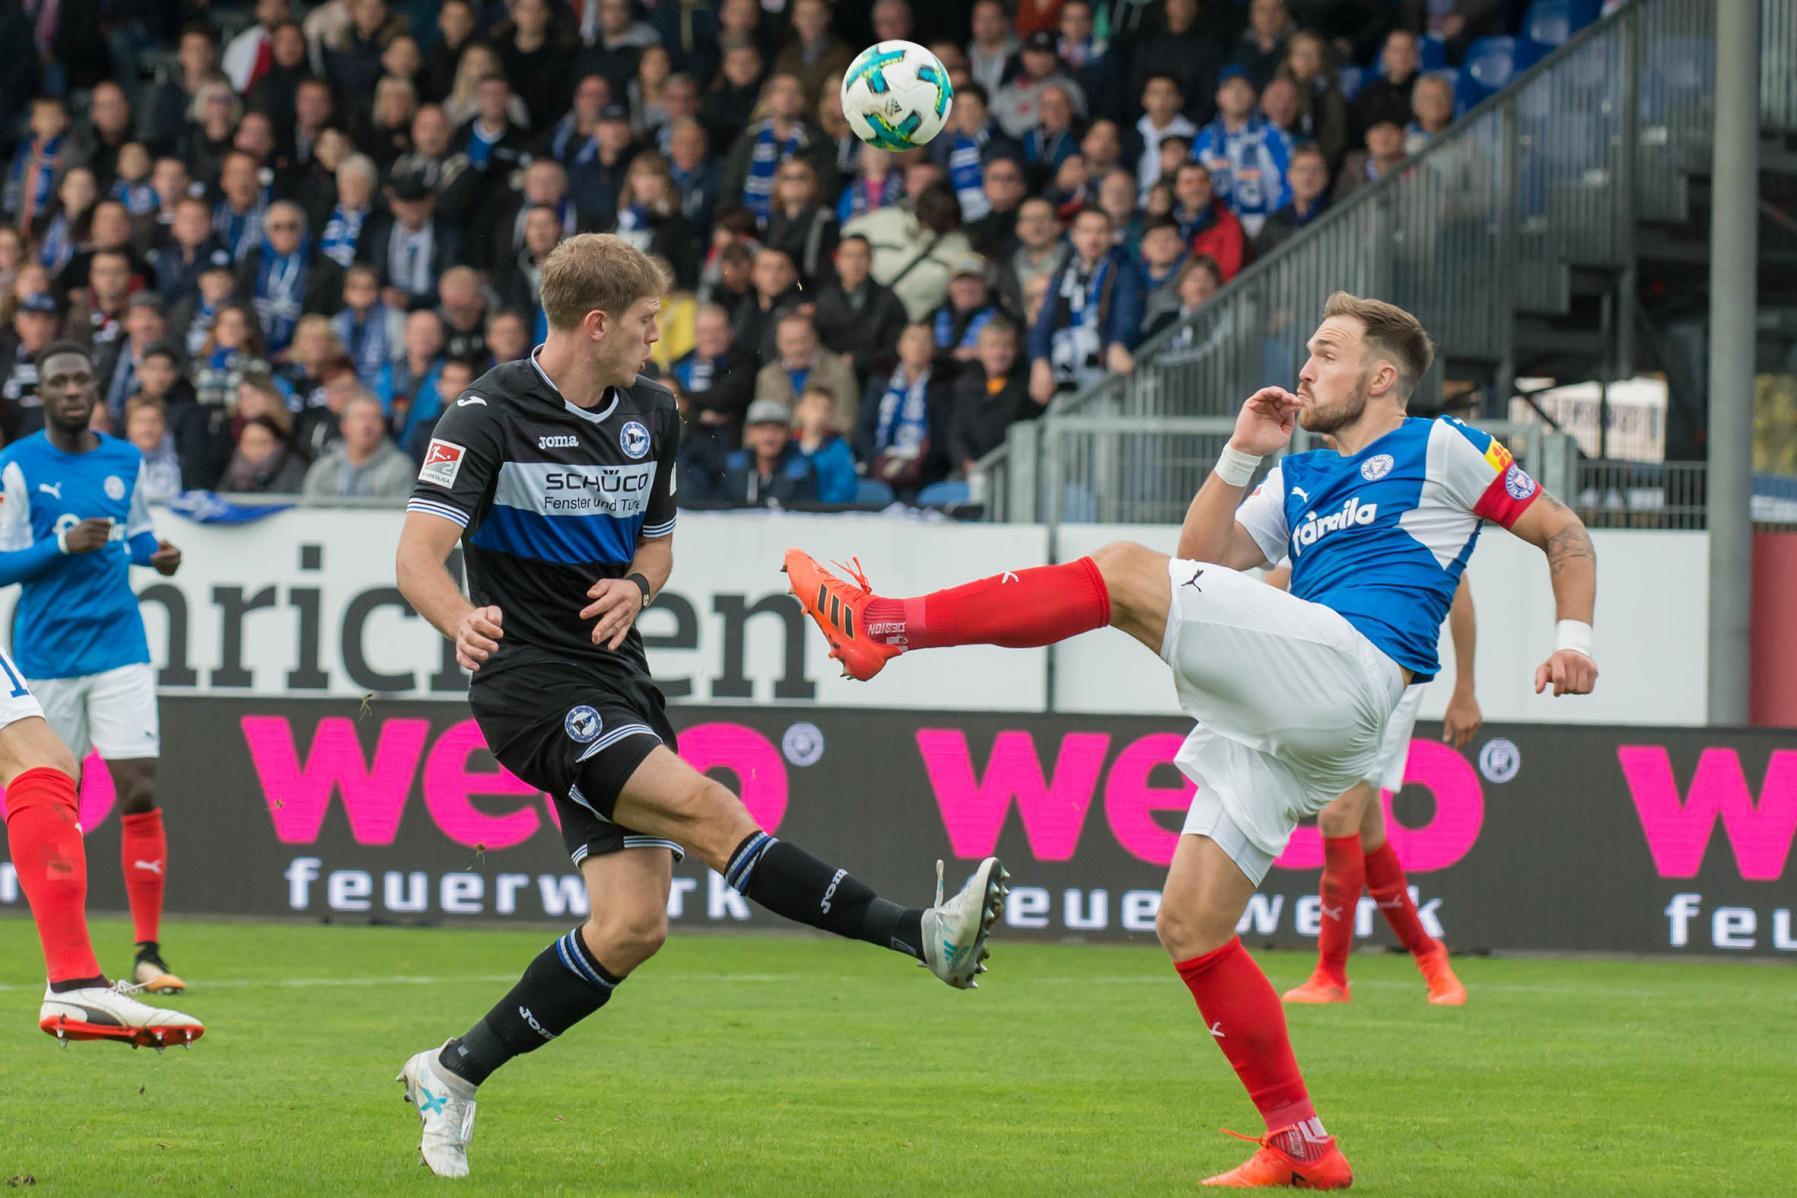 Holstein Kiel - Arminia Bielefeld 2:1